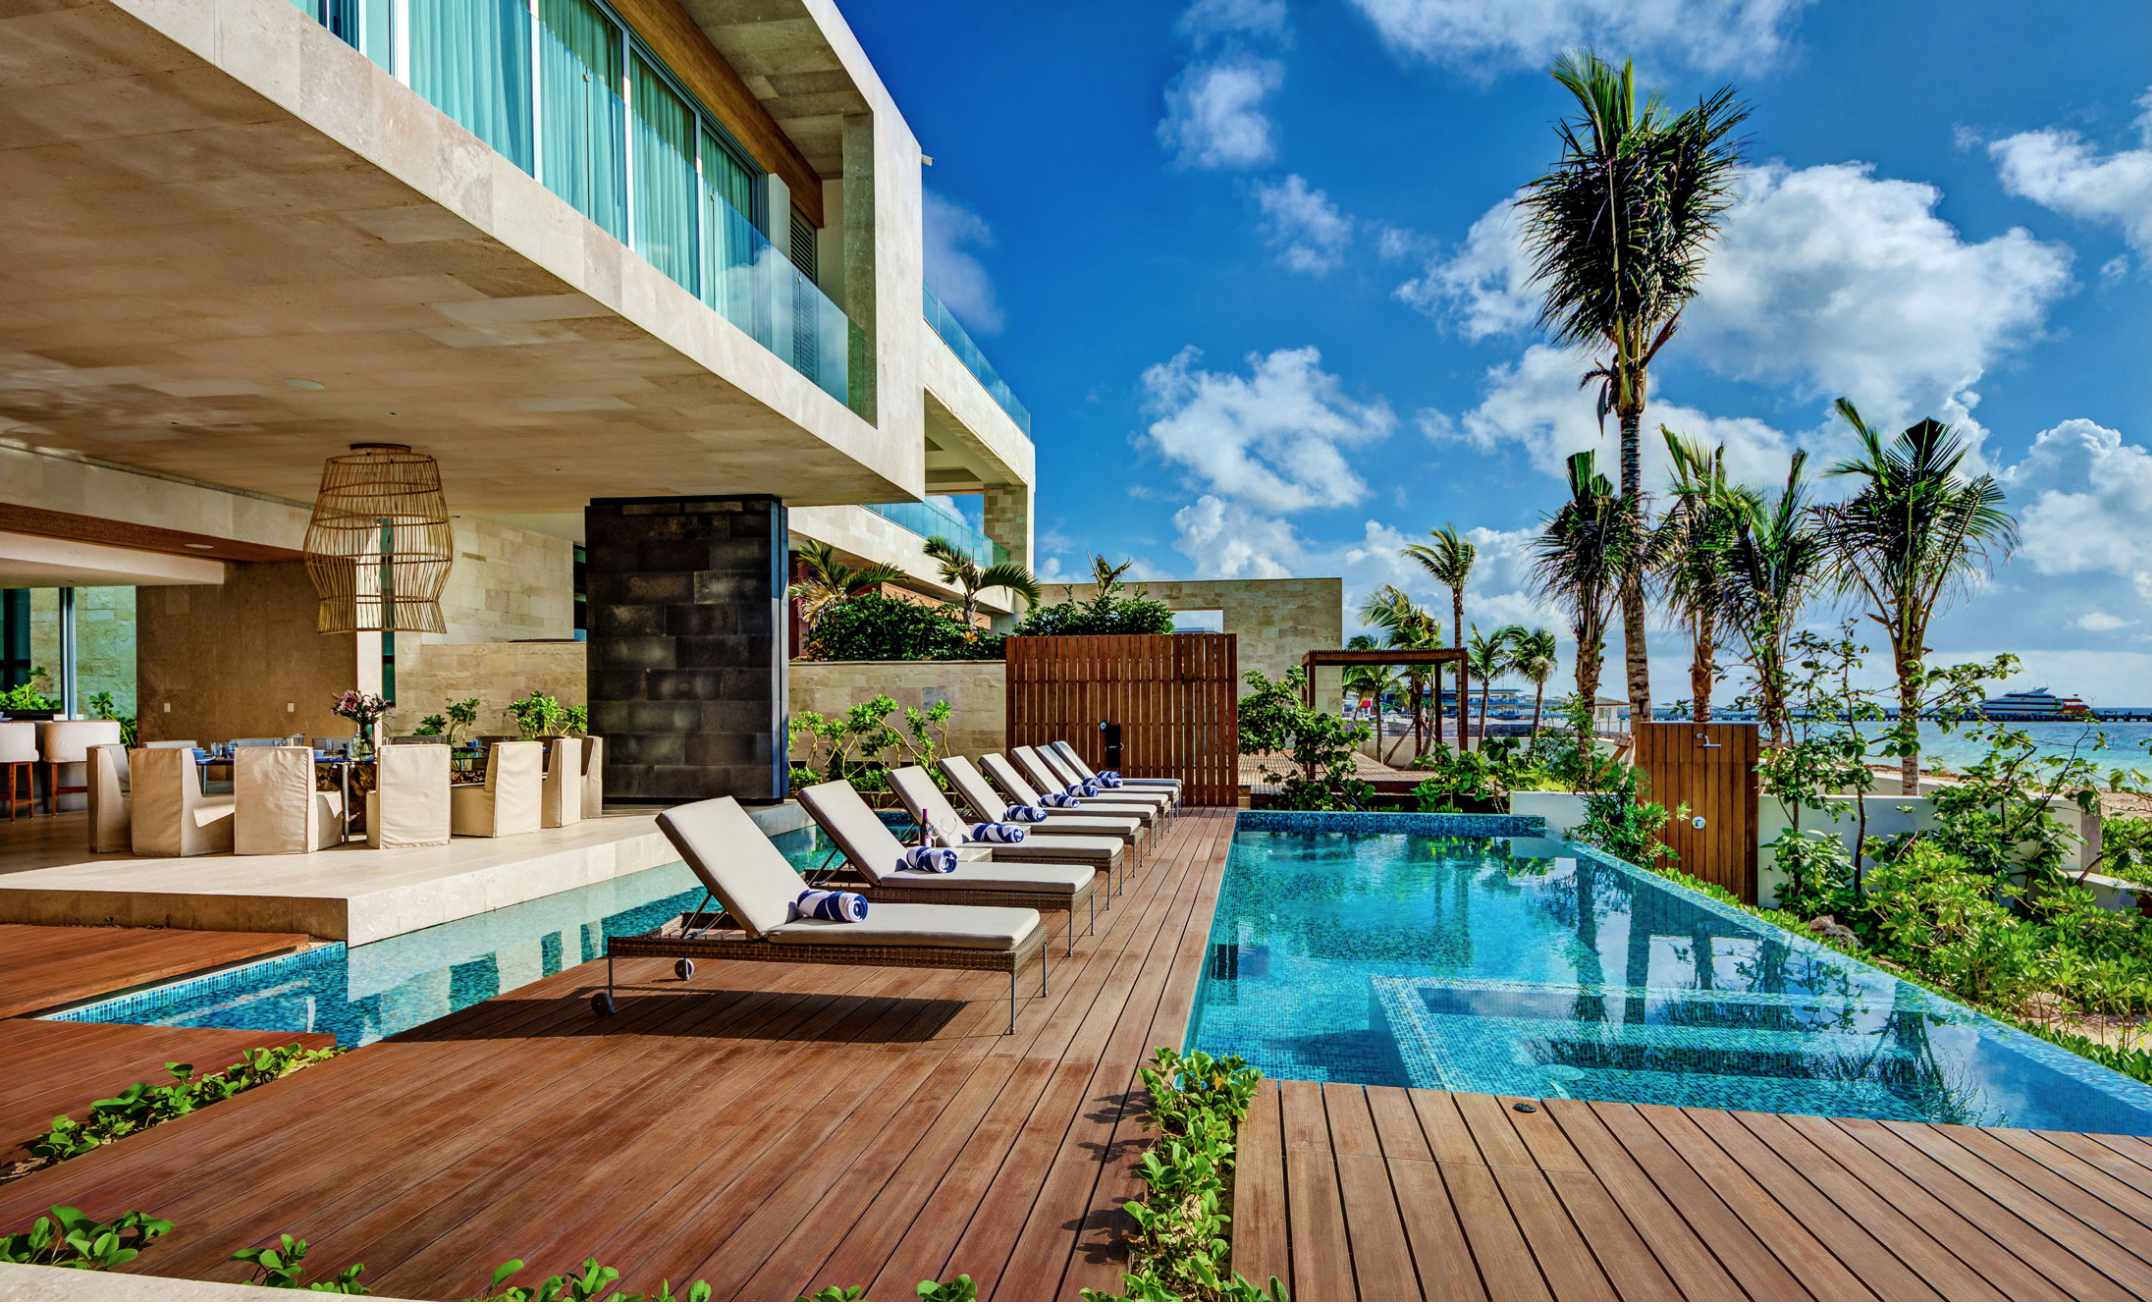 Stunning NYE Rentals in Riviera Maya, Mexico!